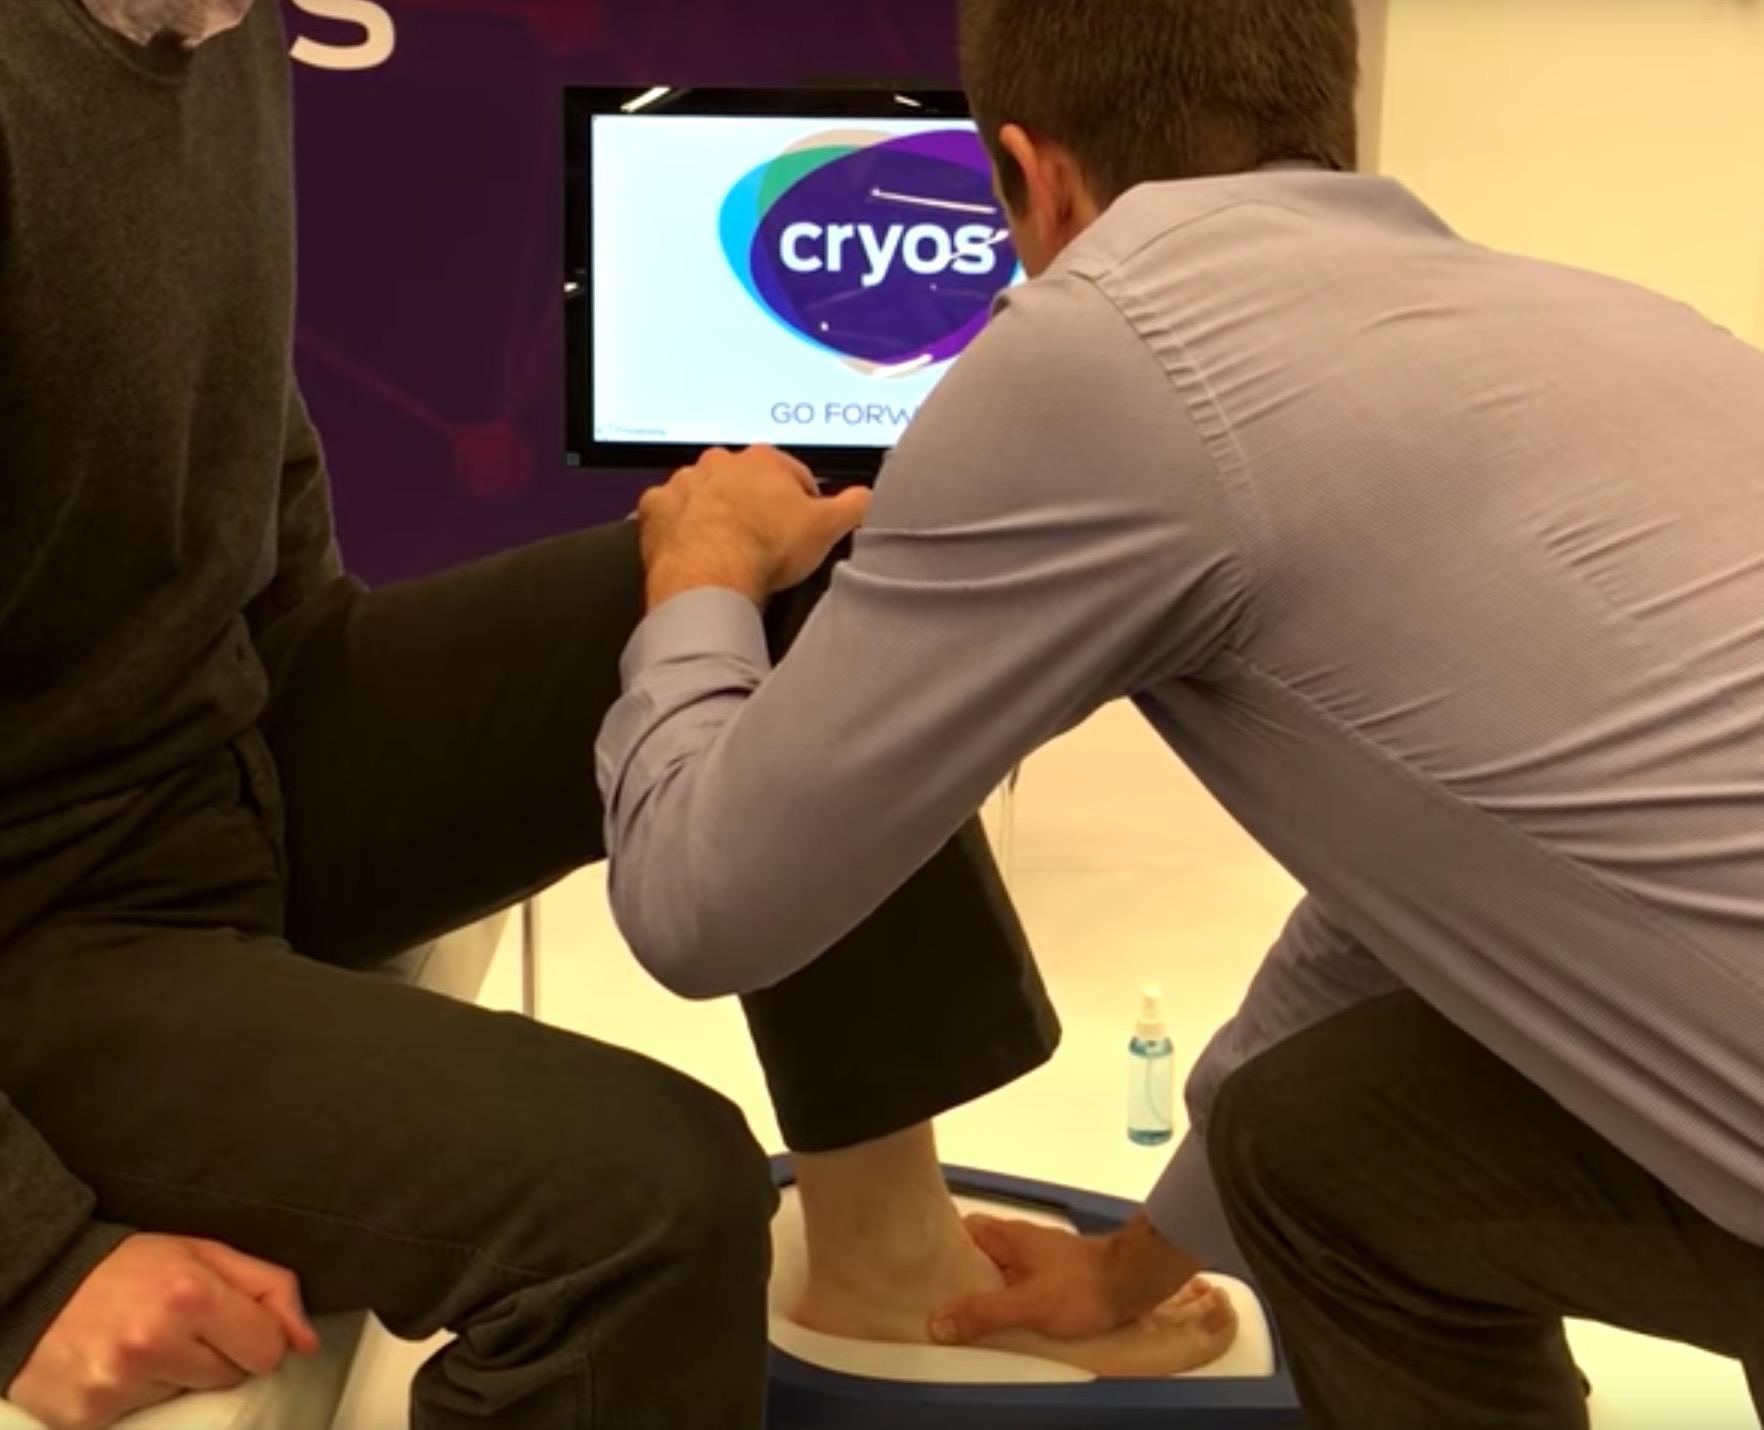 Cryoscan3D in action